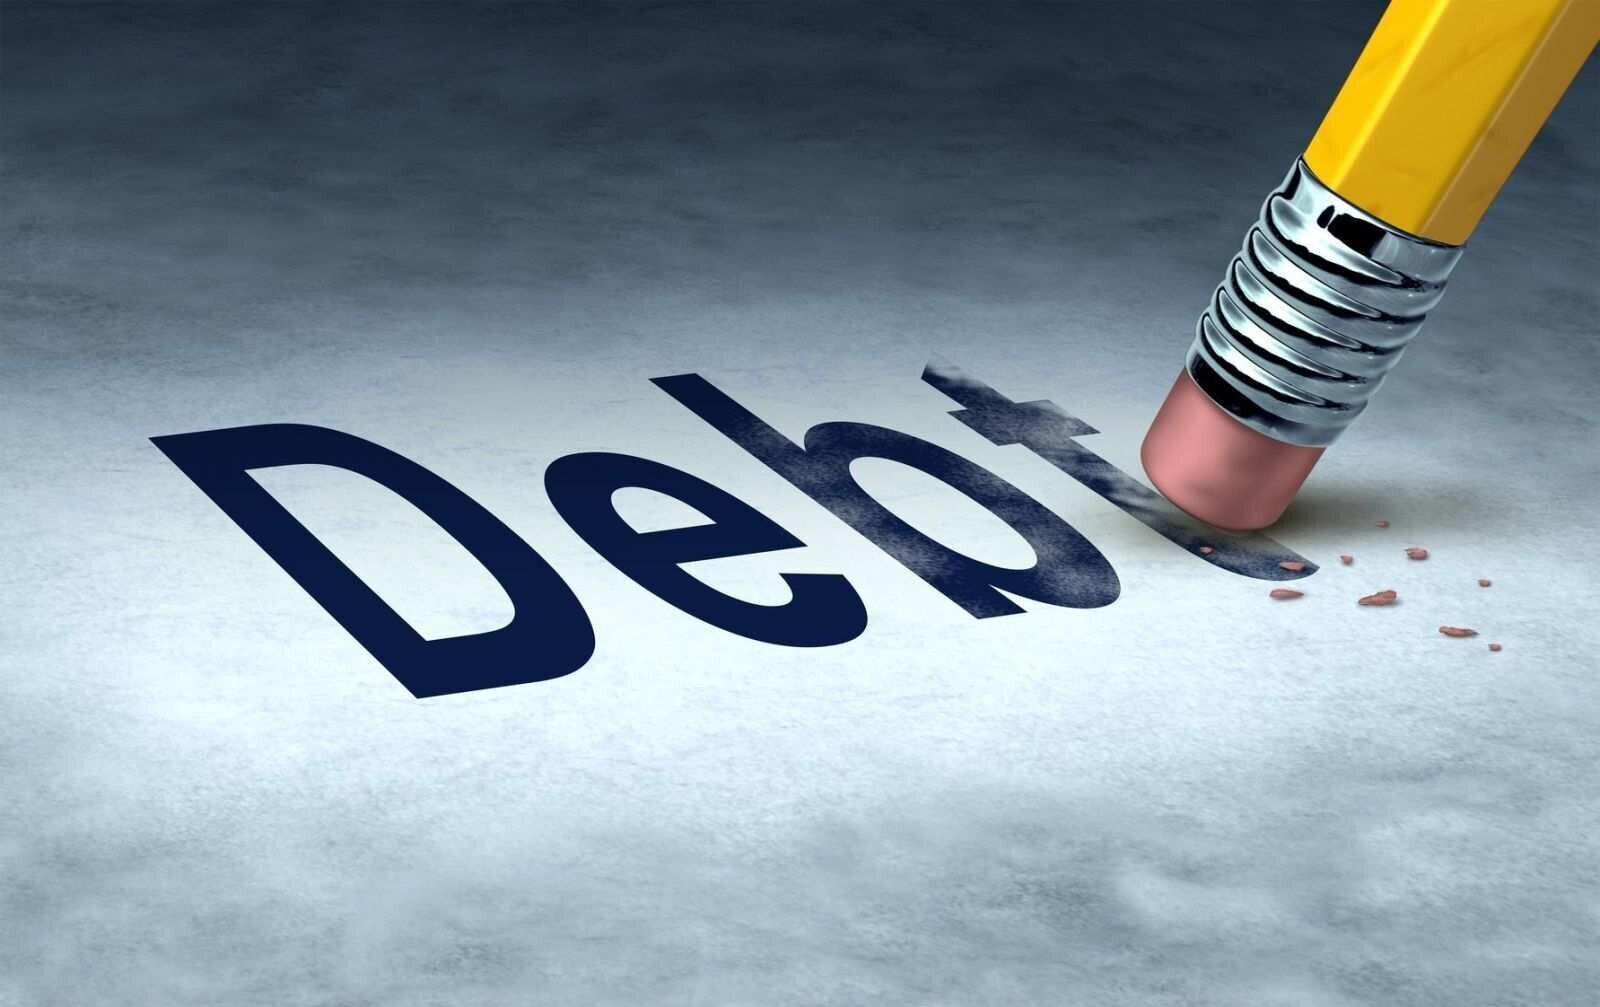 External Debt of Azerbaijan Reduced during H1 2020